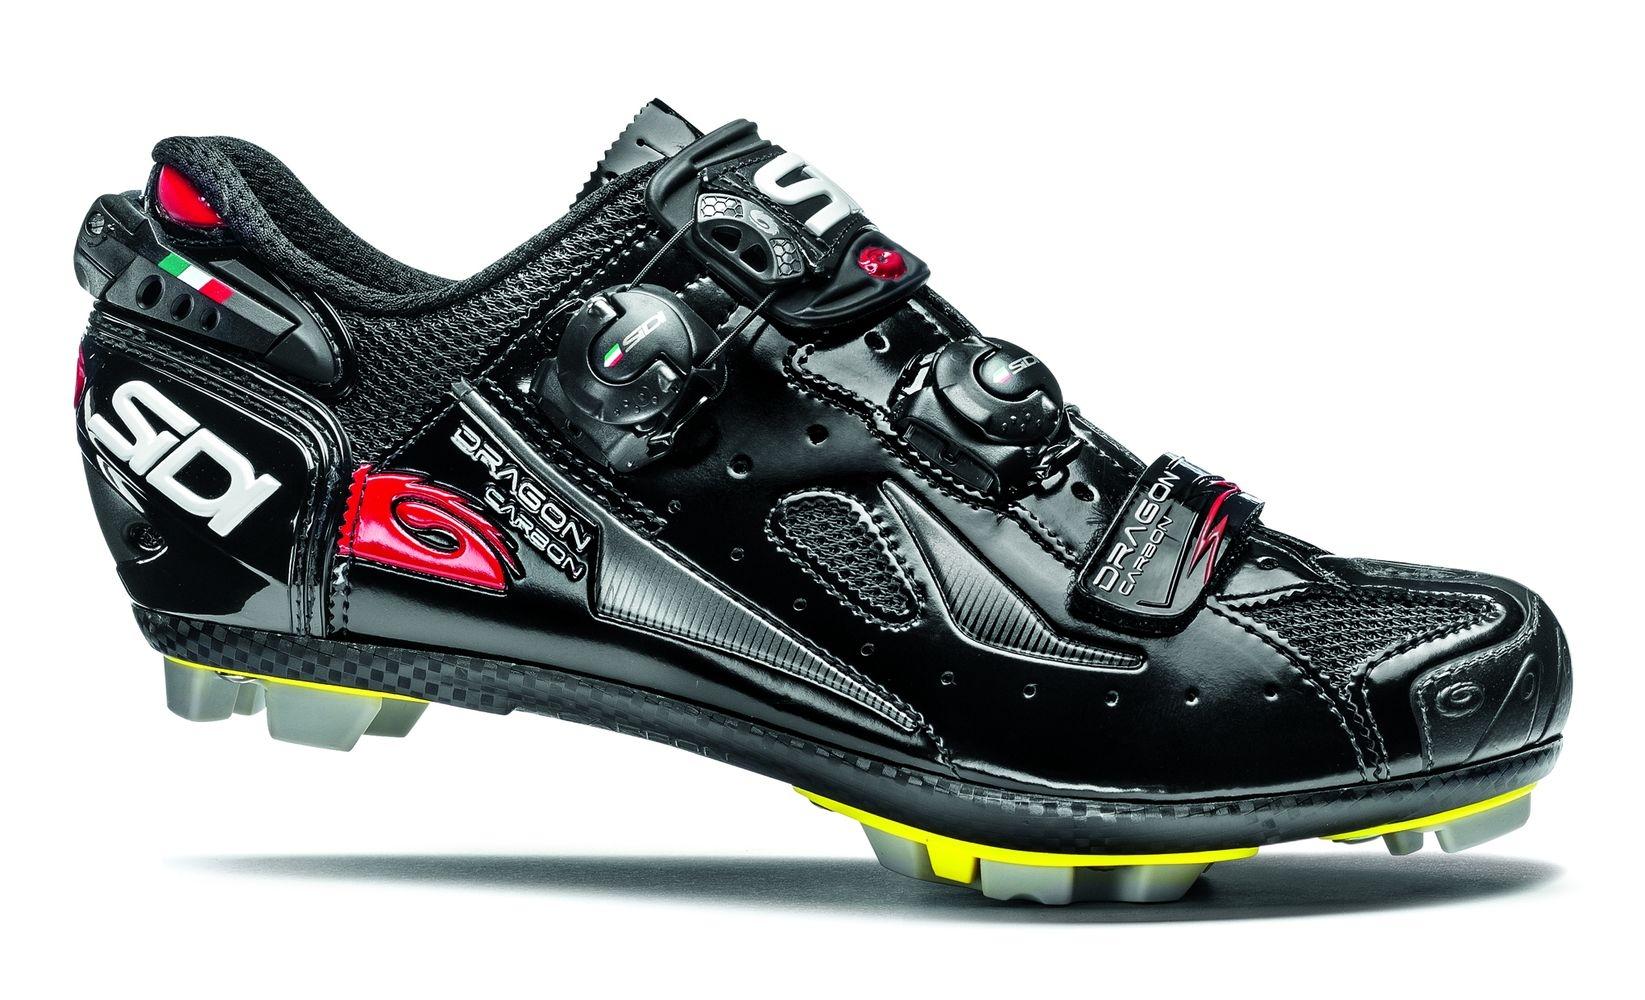 Chaussures Sidi MTB DRAGON 4 SRS Carb. Noir - 41